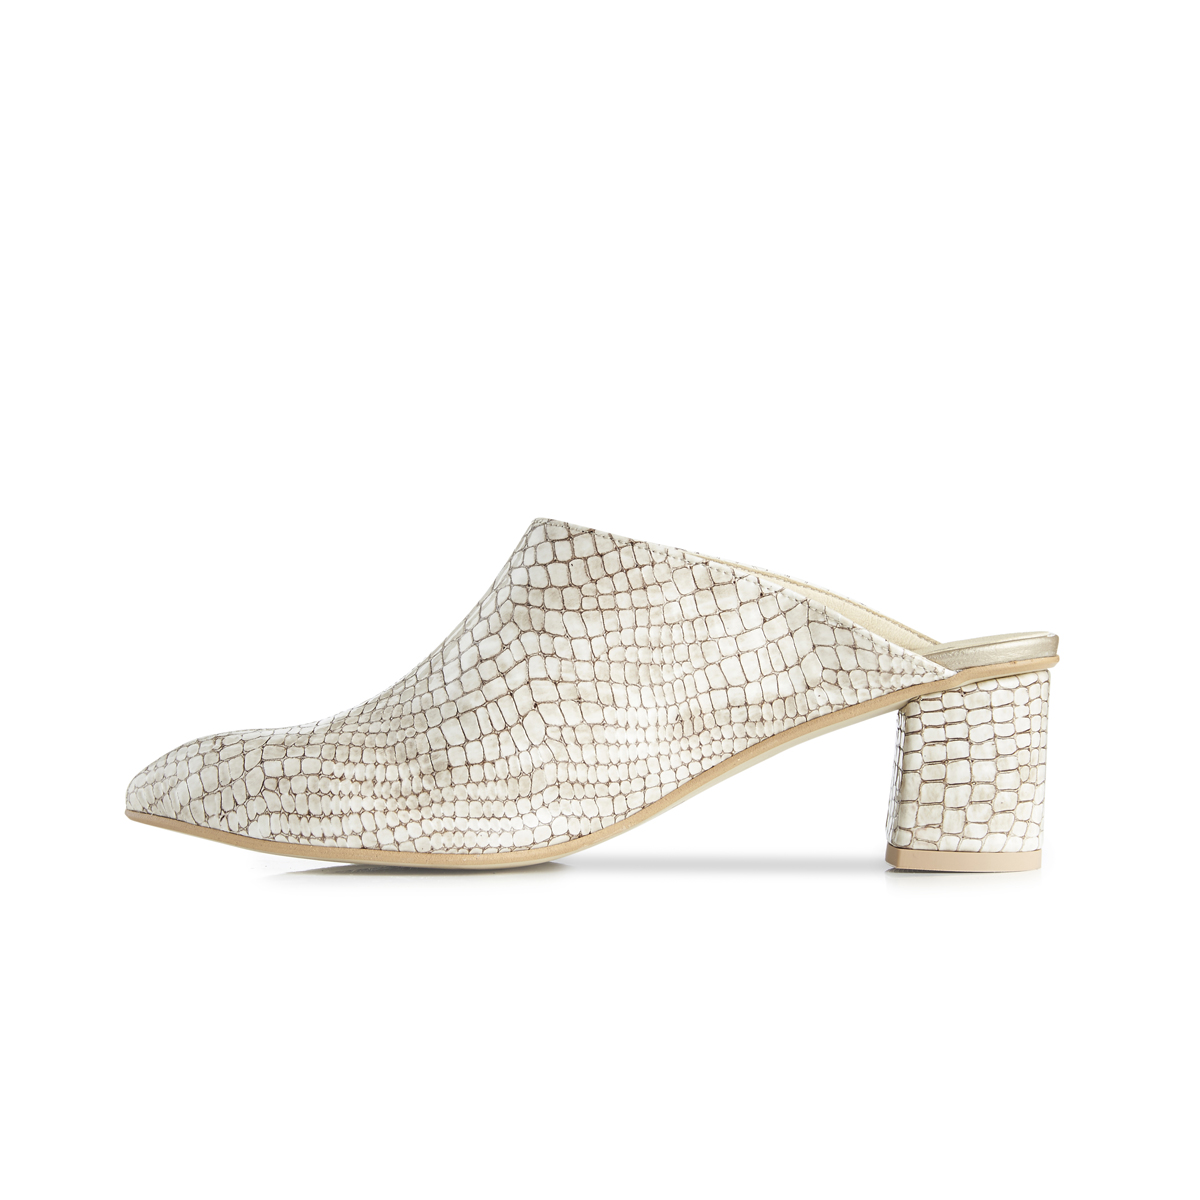 Lou croc leather block heel mules - beige